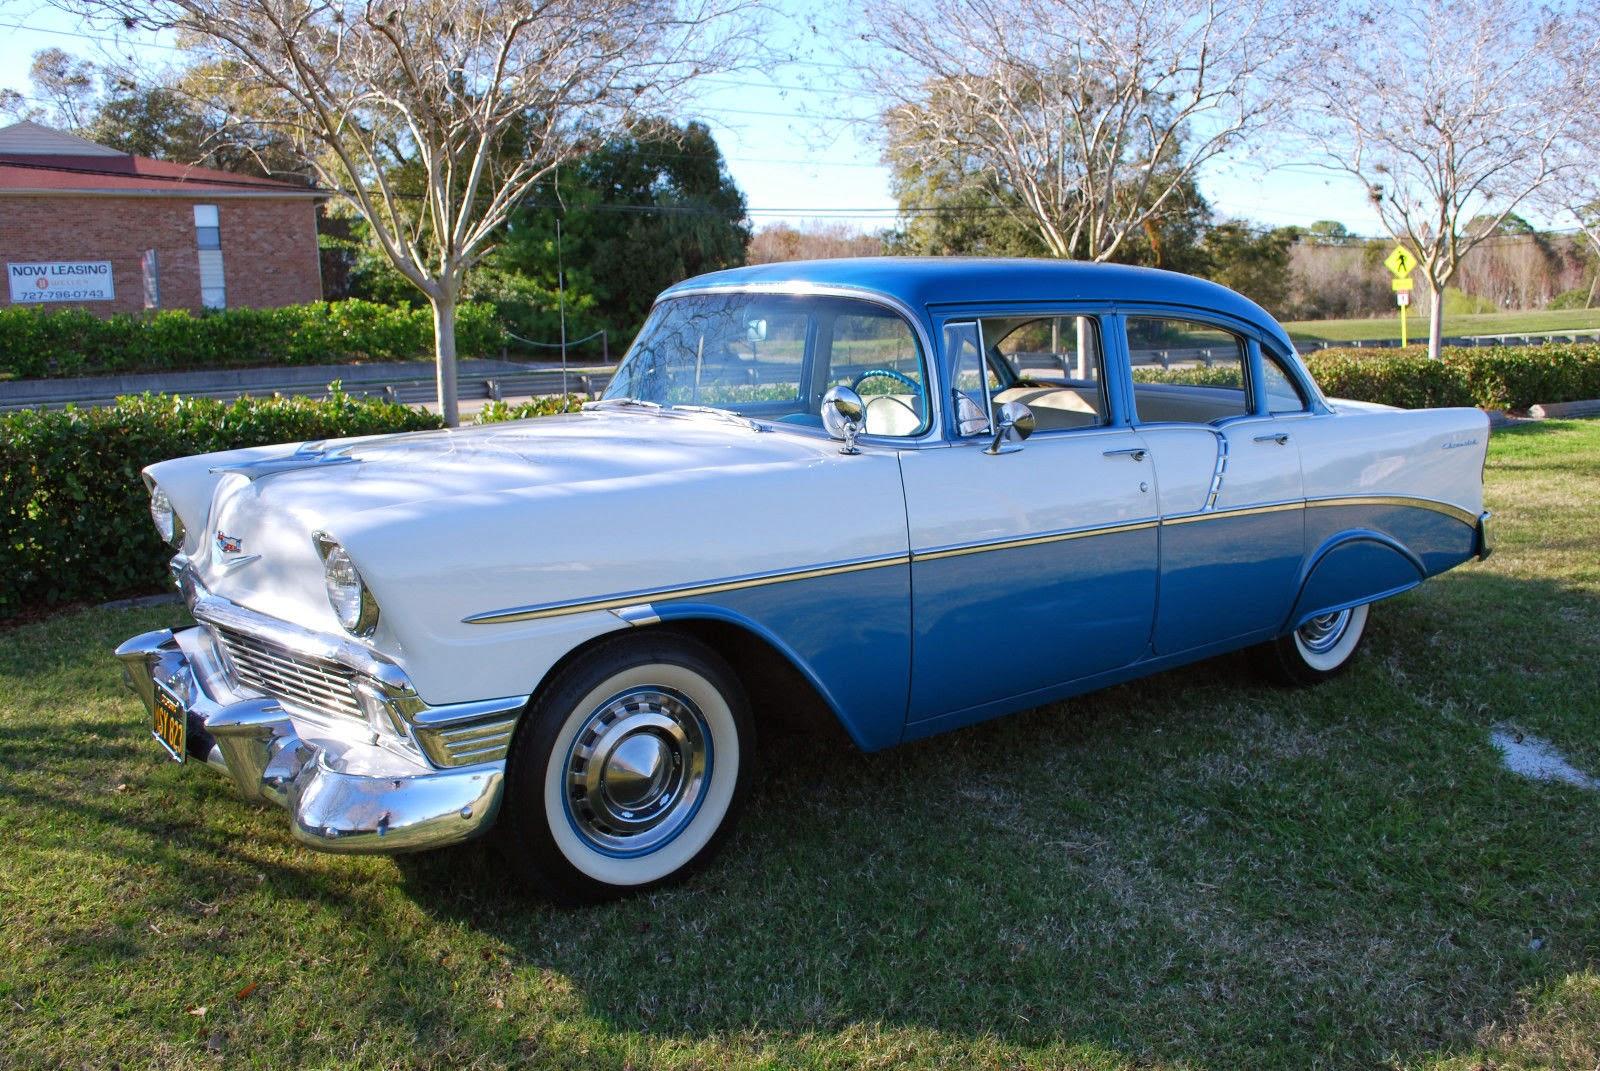 All American Classic Cars: 1956 Chevrolet Two-Ten 4-Door Sedan